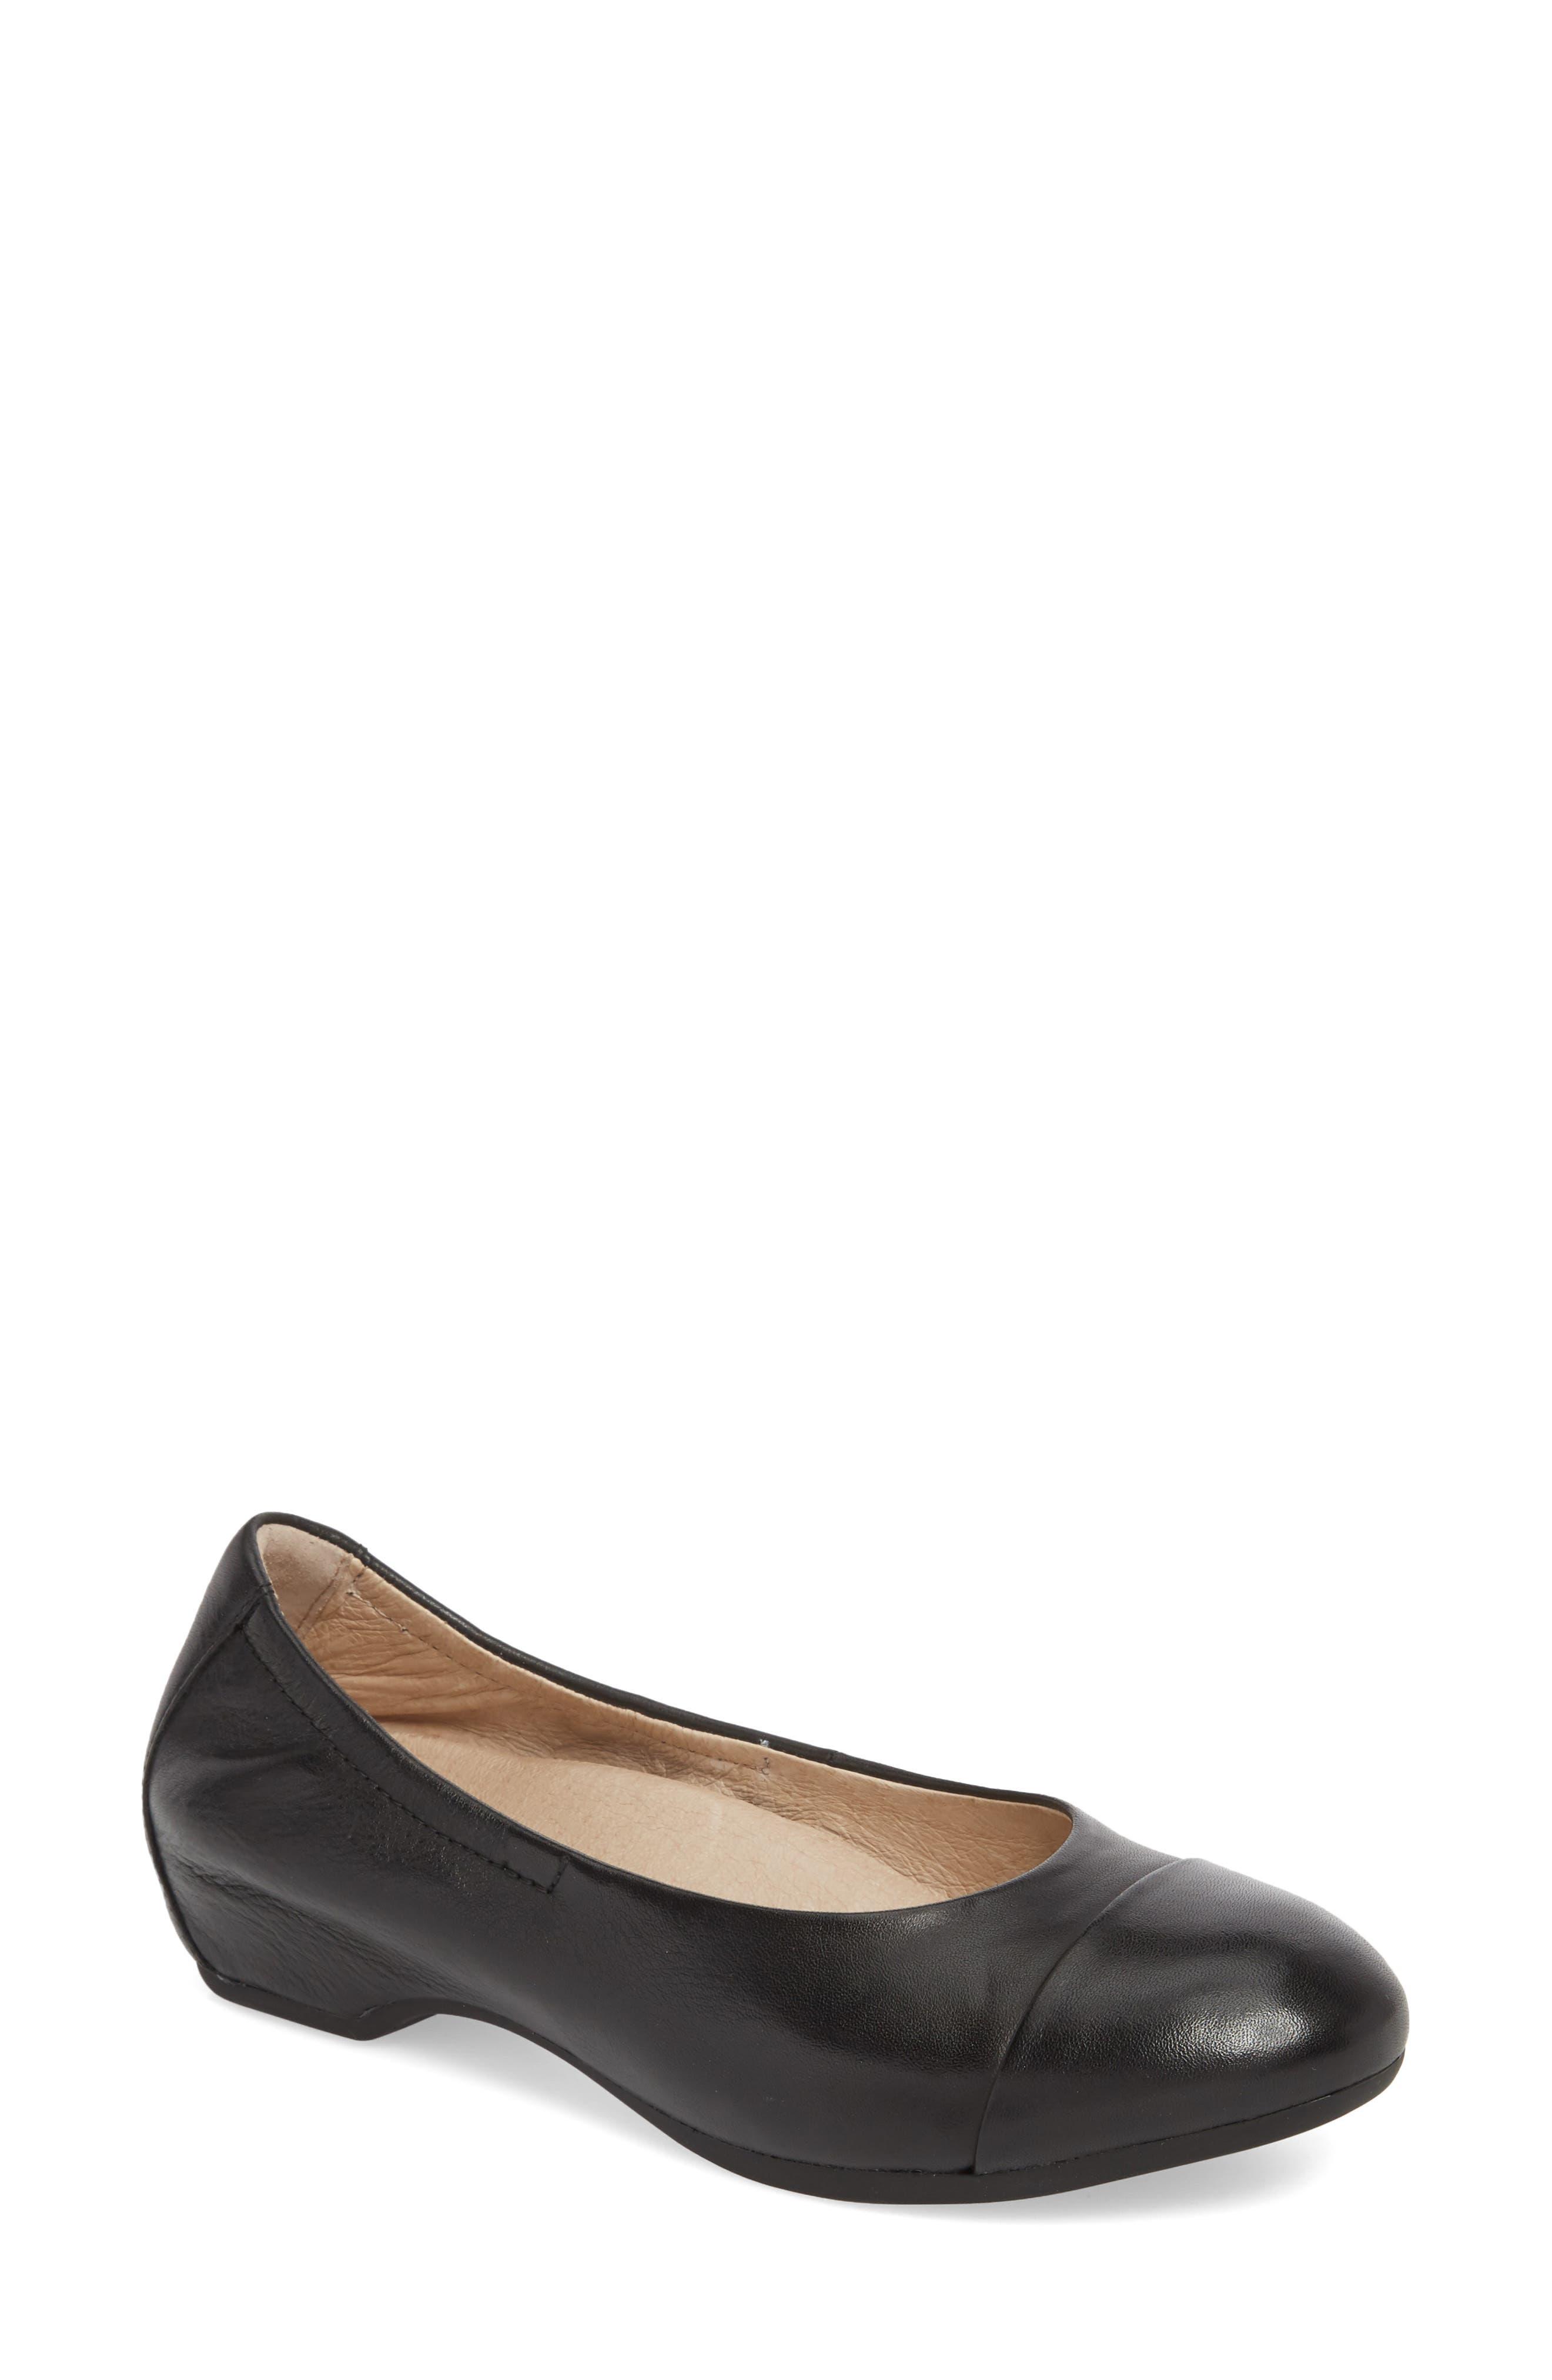 Lisanne Cap Toe Ballet Flat,                         Main,                         color, BLACK MILLED LEATHER